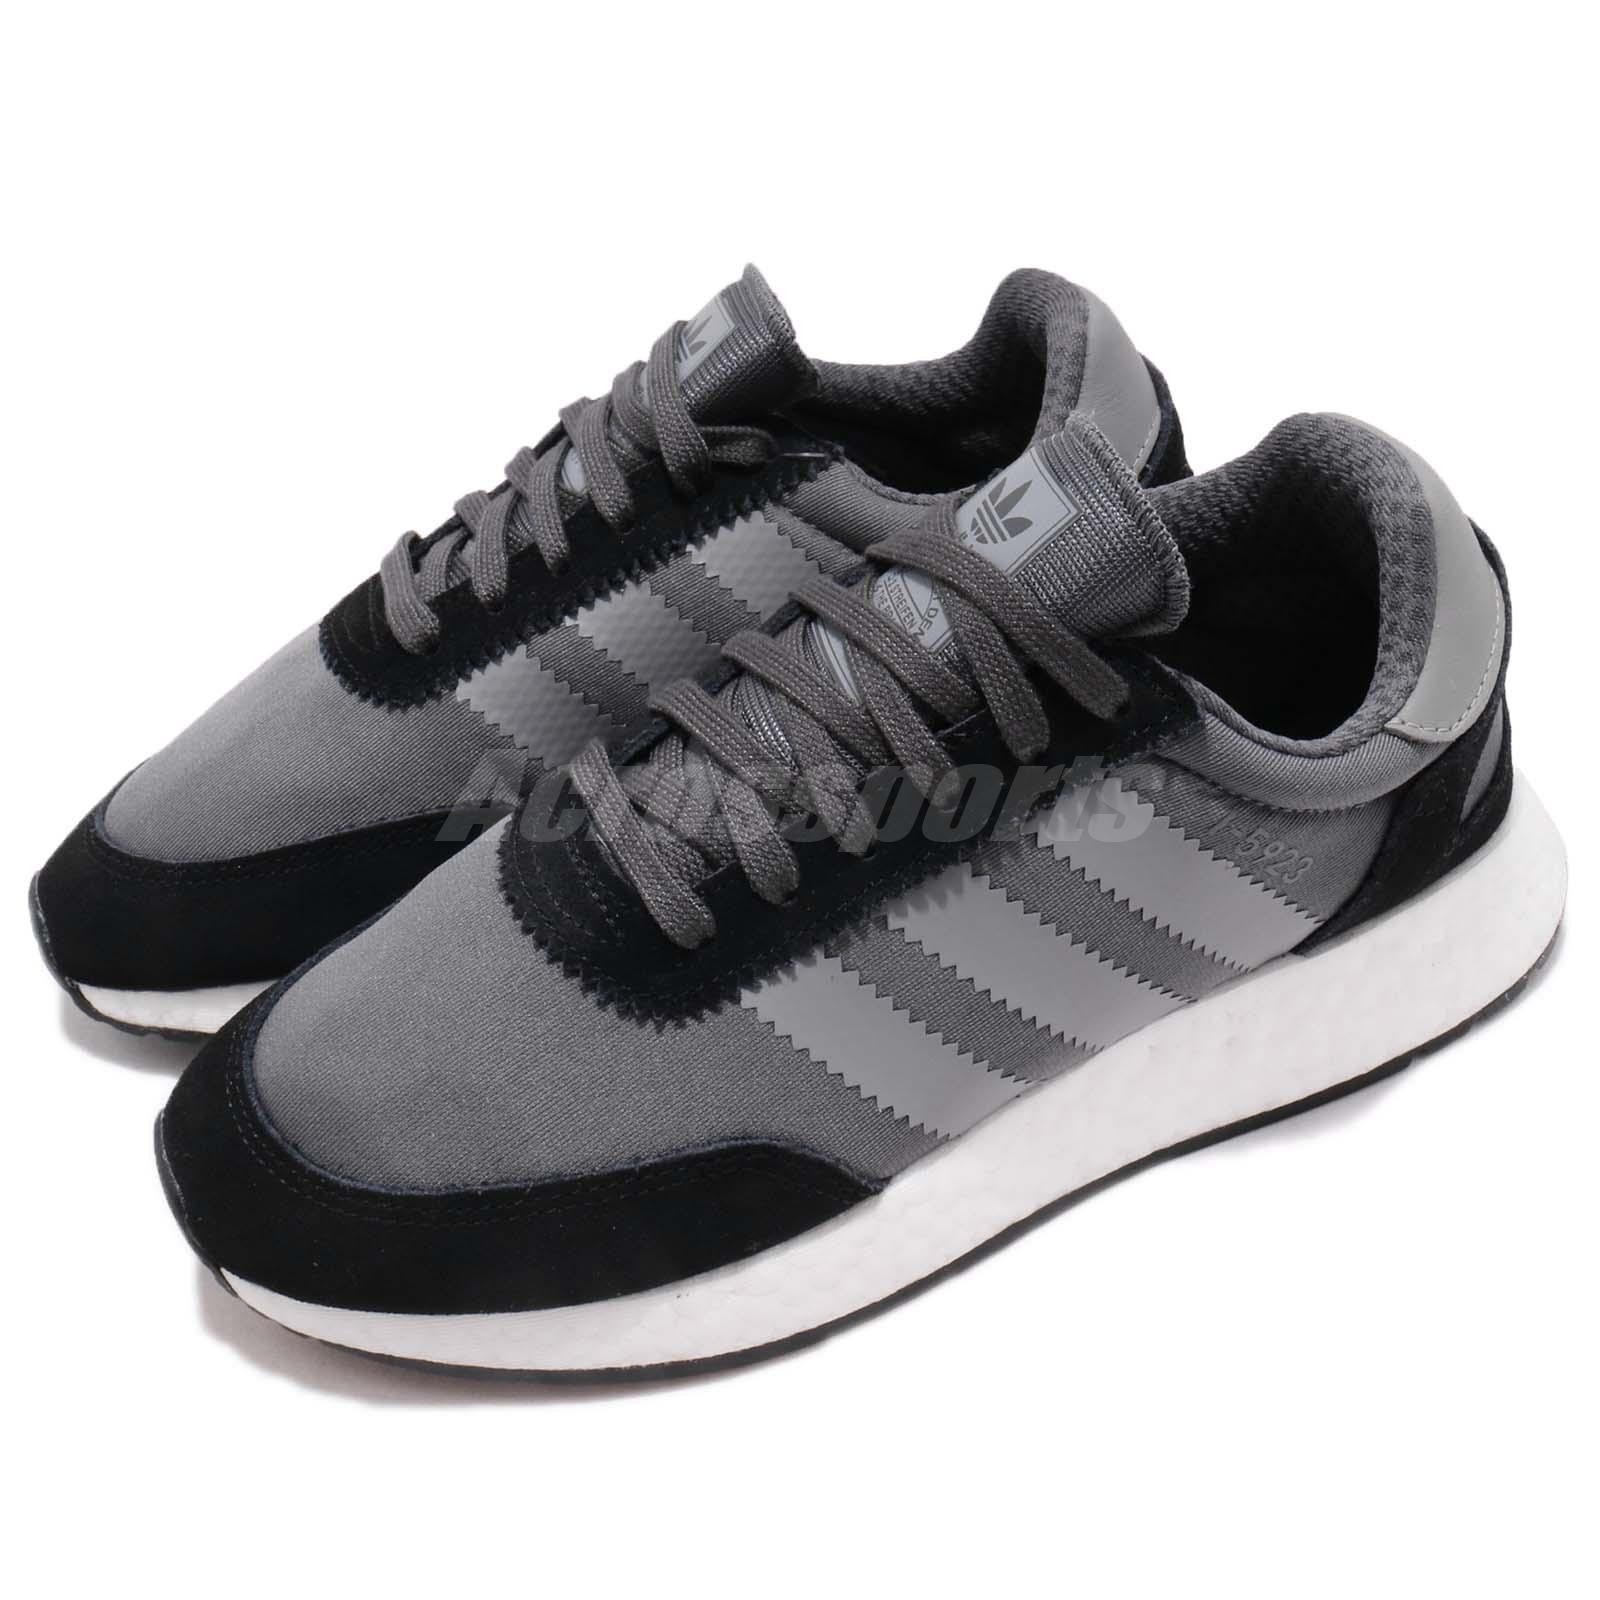 Dettagli su adidas Originals I 5923 W Iniki Runner Black Grey Women Running Shoes D97353